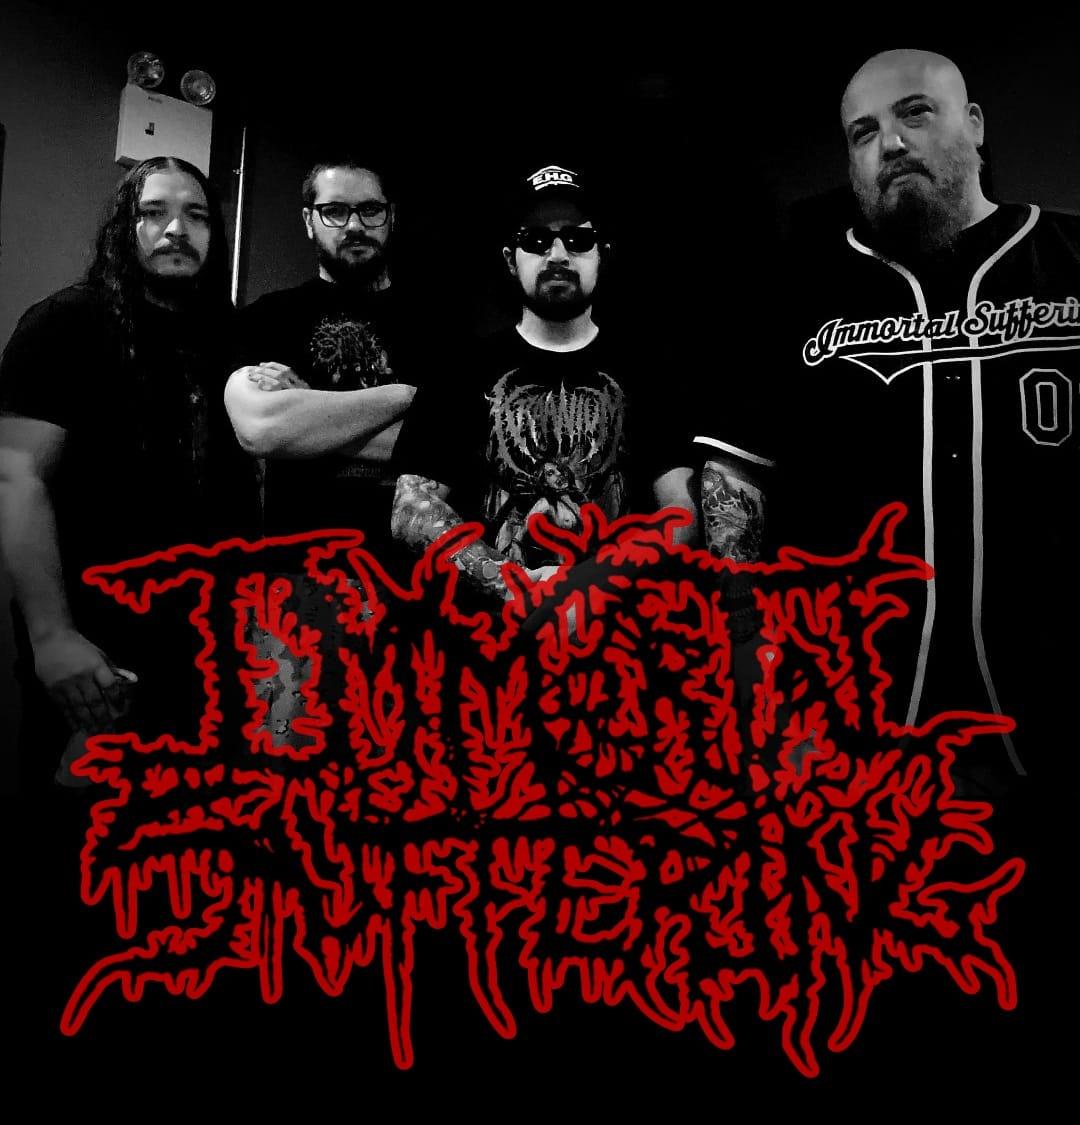 Immortal Suffering - Photo